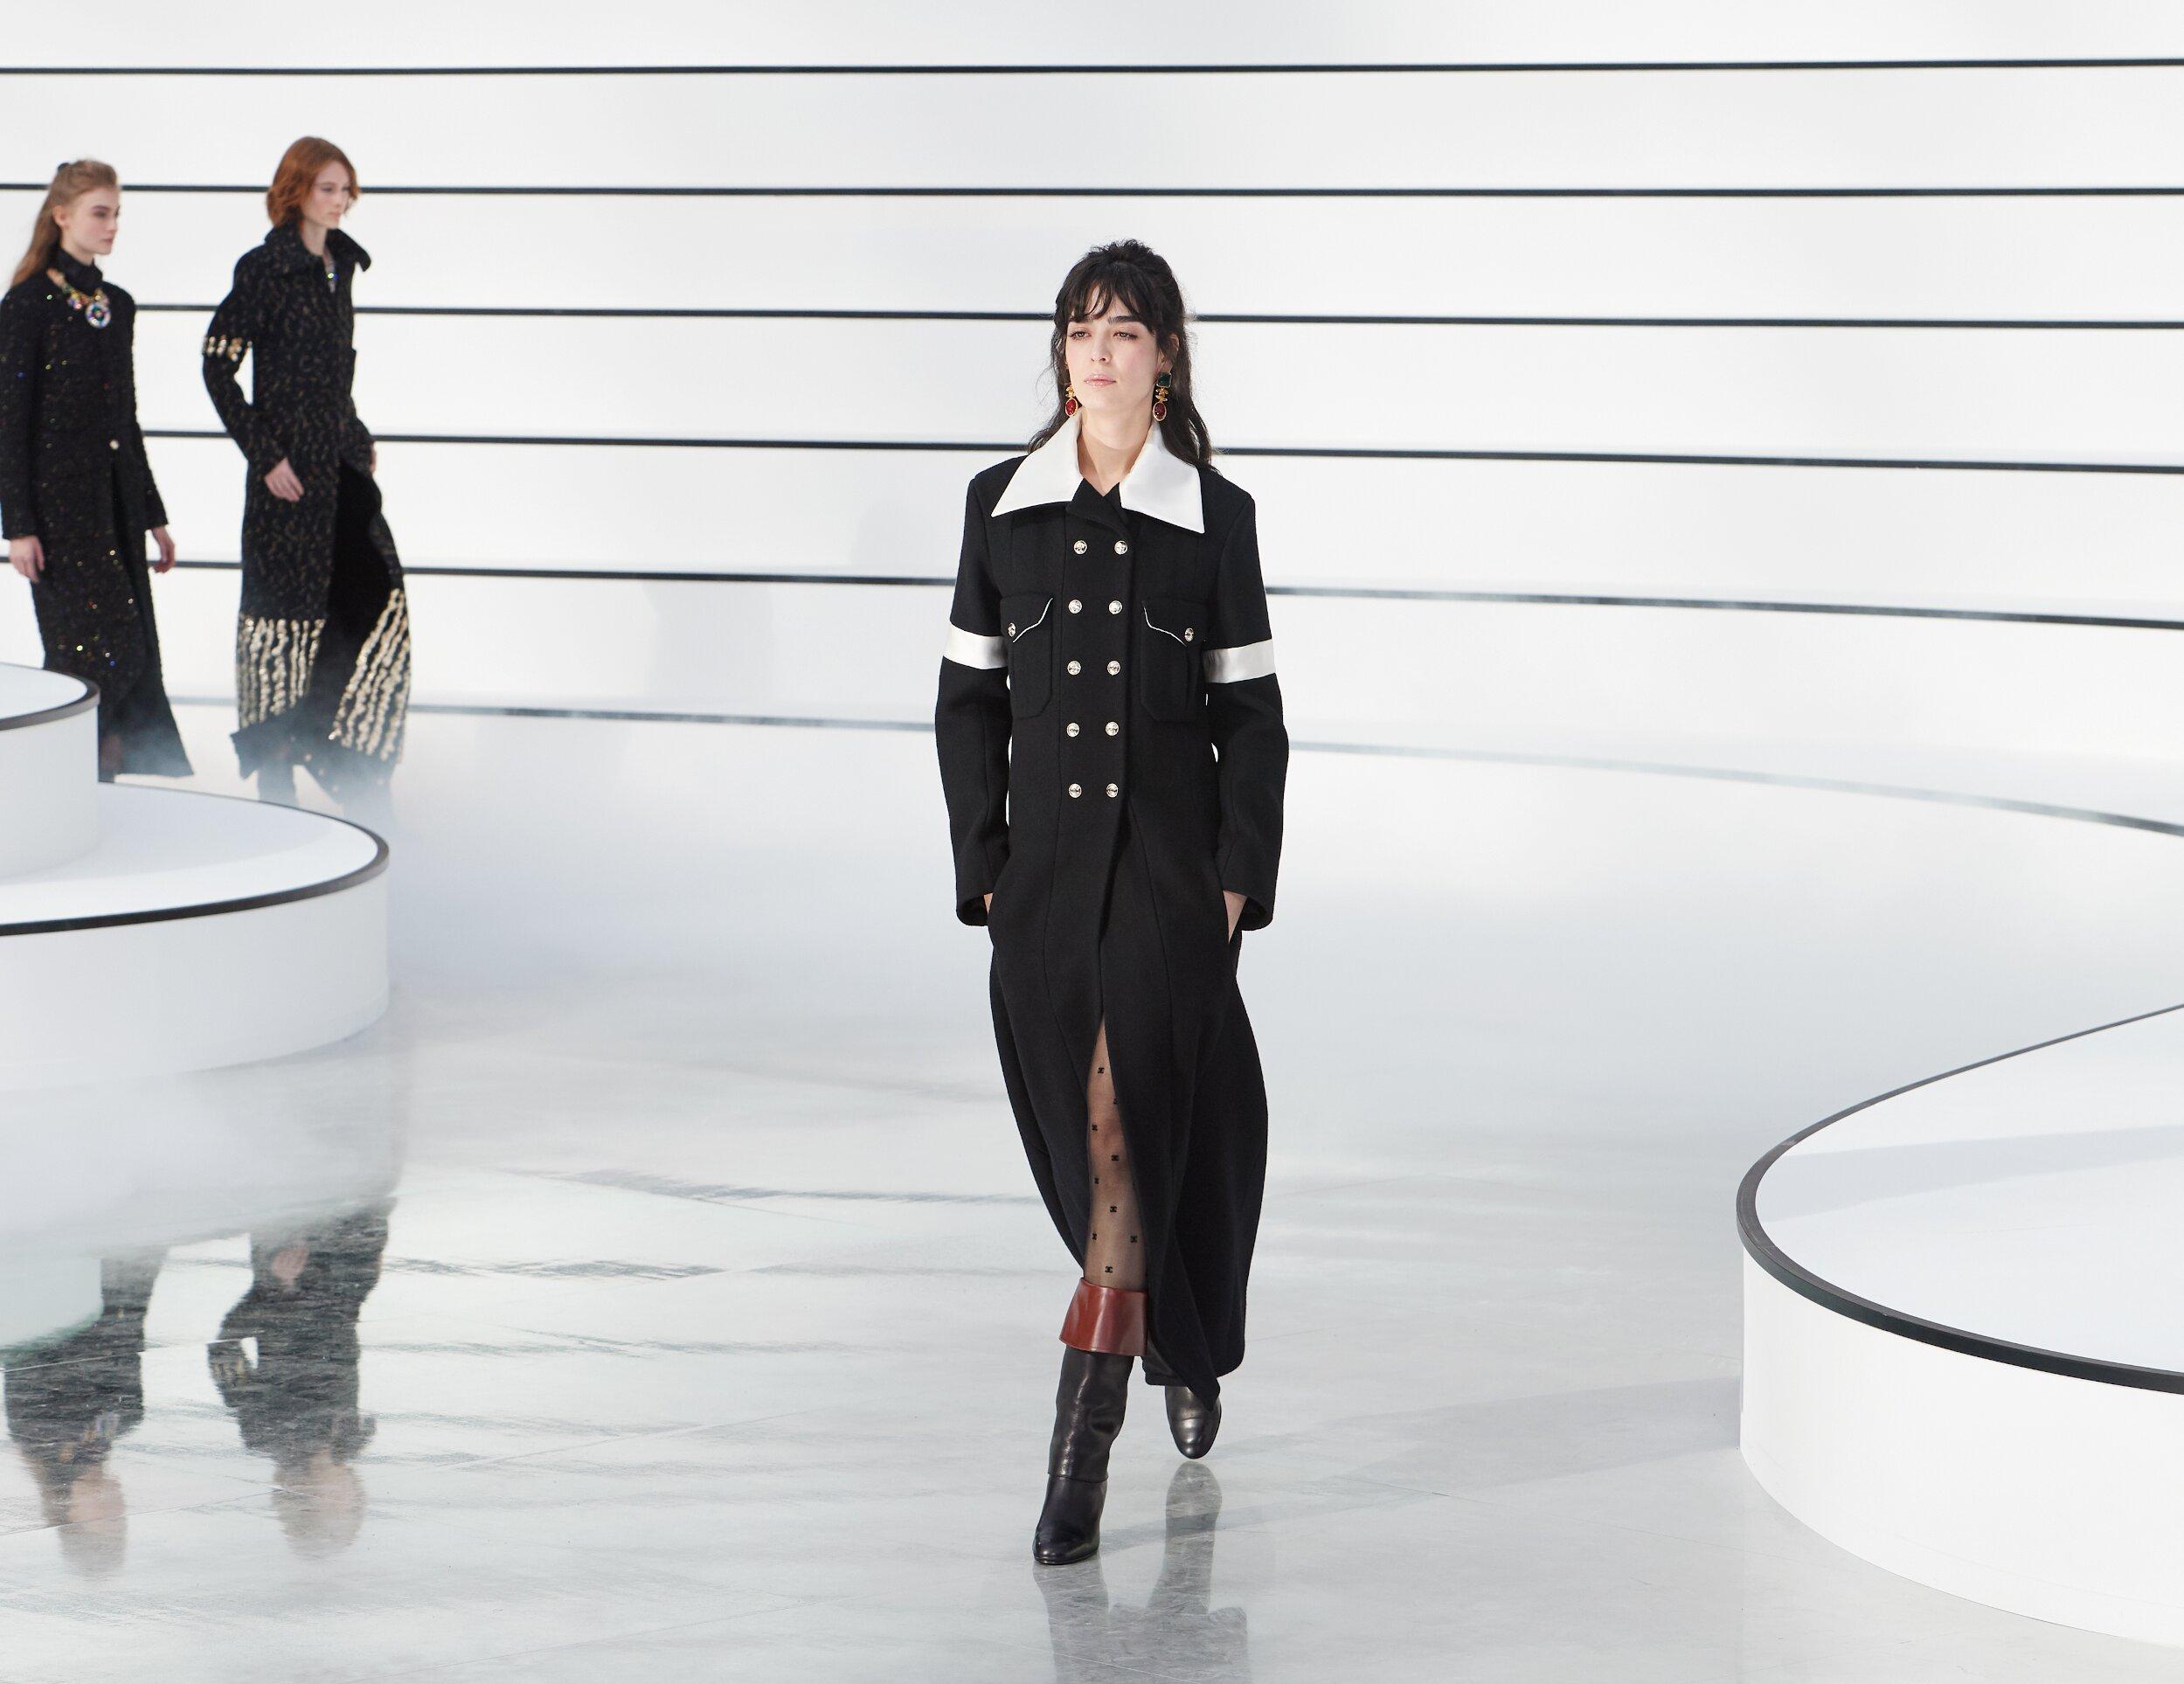 2020 Catwalk Chanel Woman Fashion Show Winter